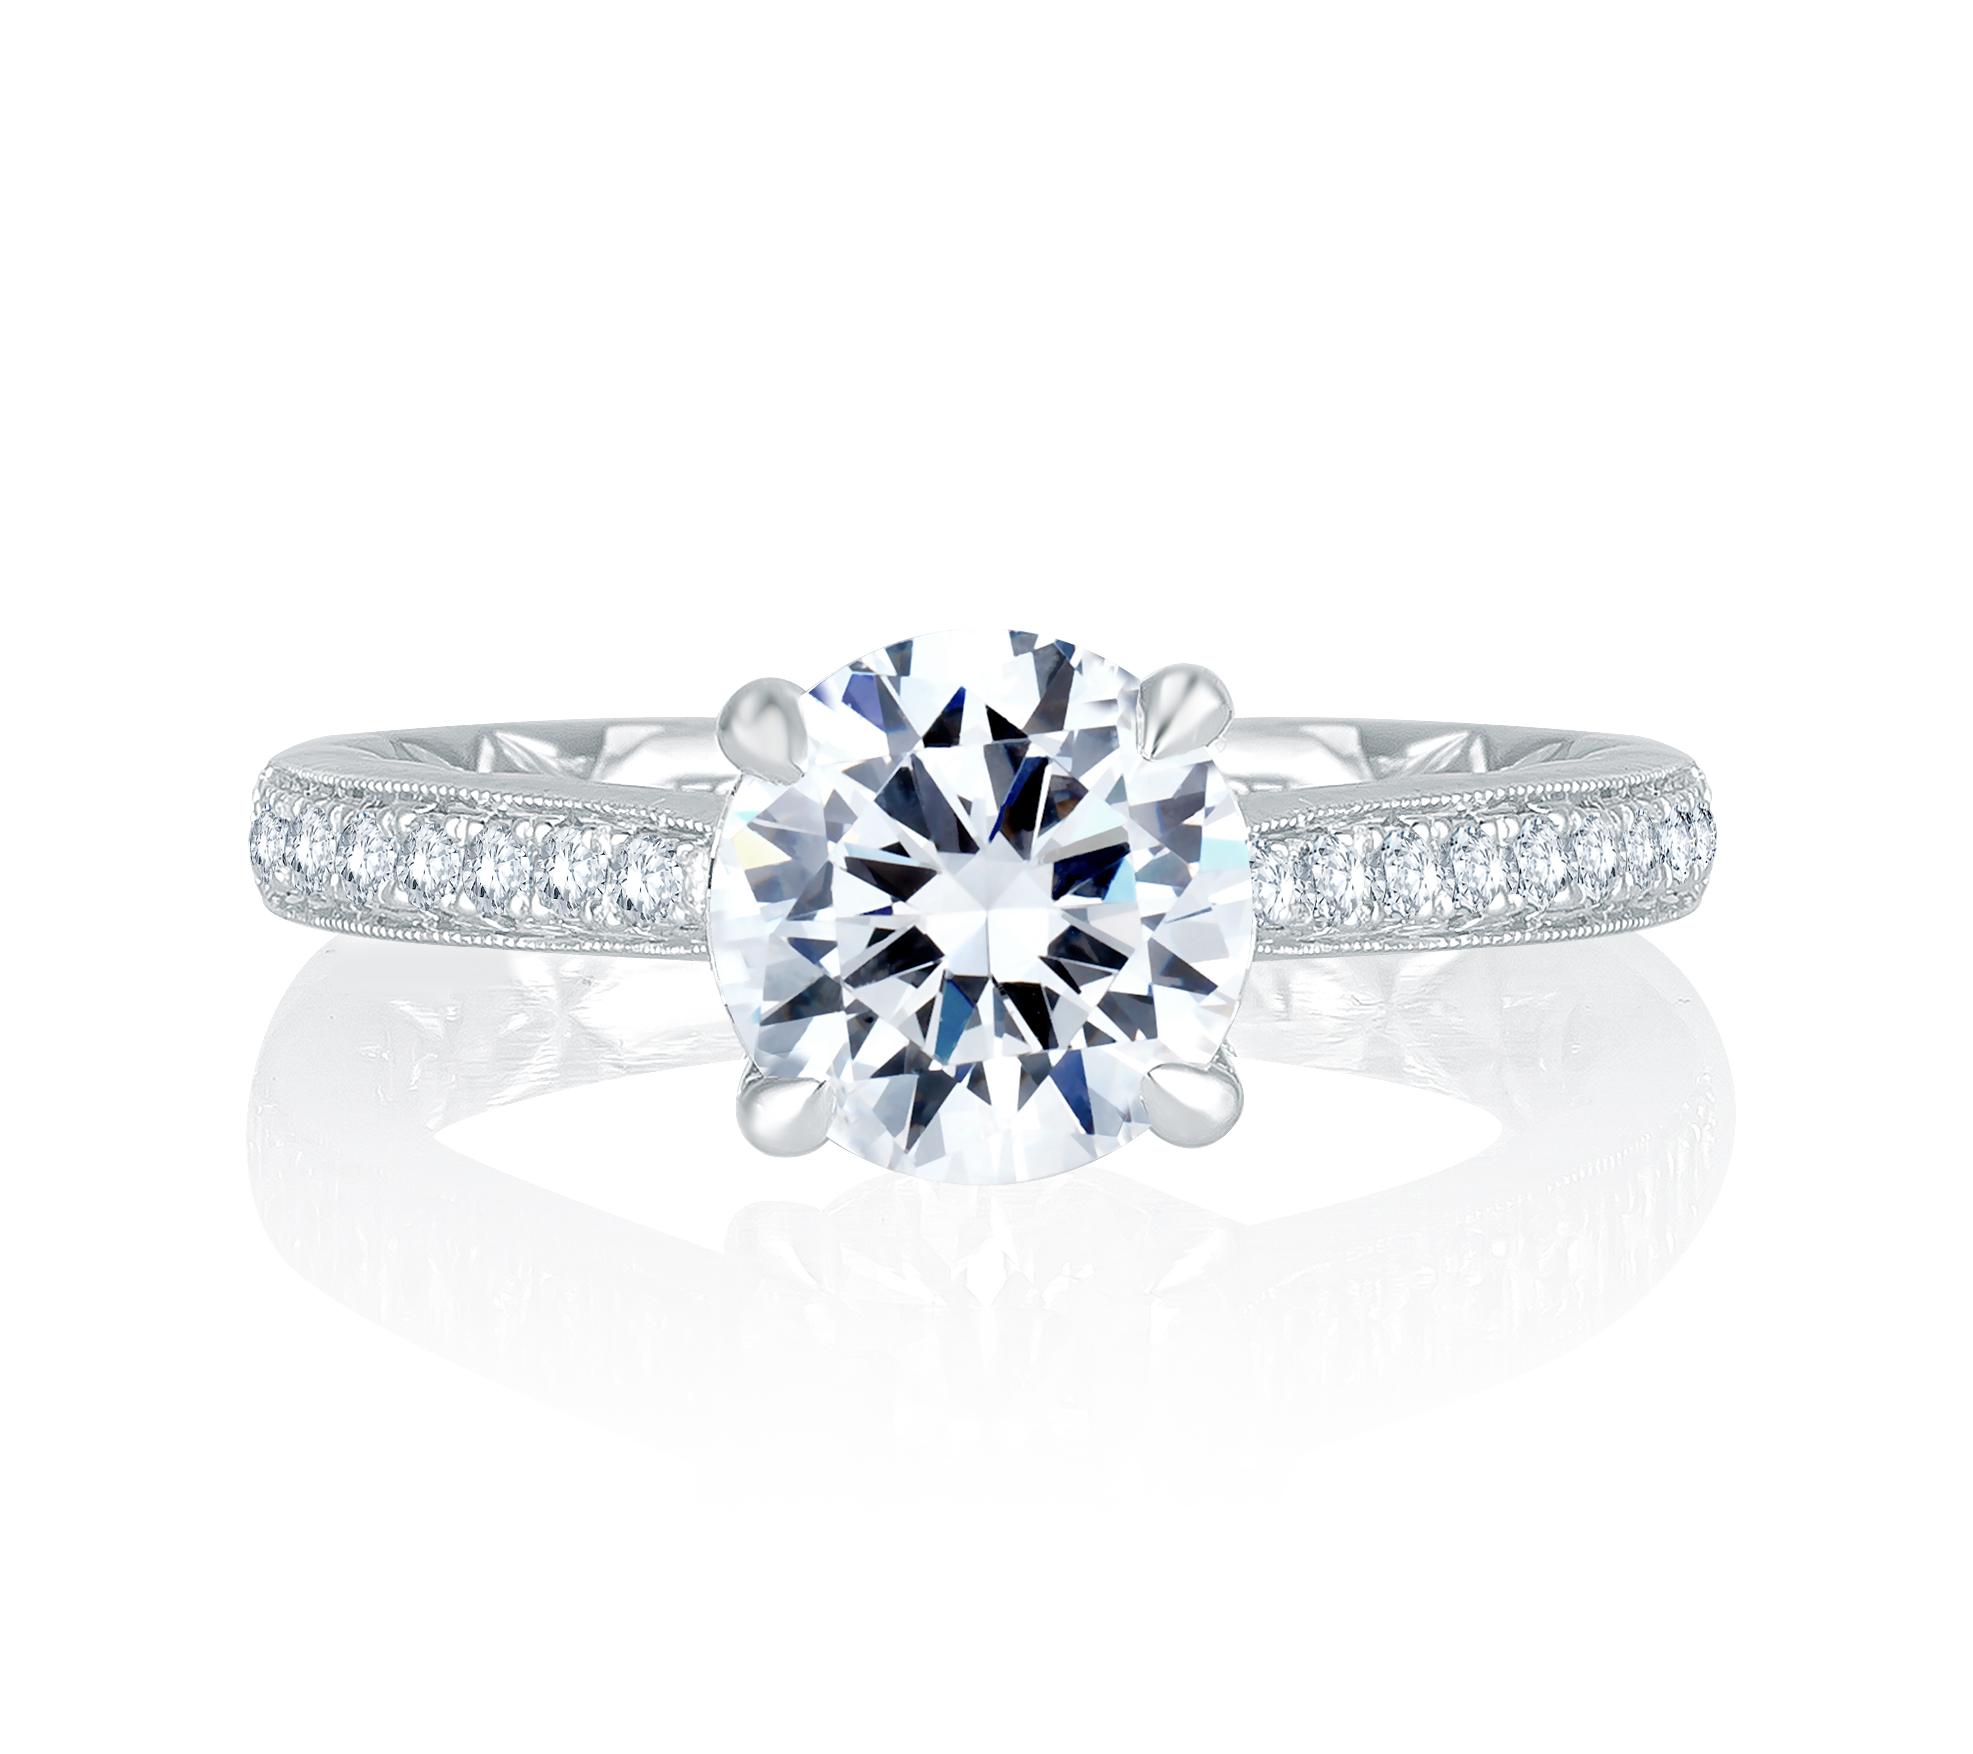 Diamond Engagement Ring | Camarillo Jewelers | Van Gundys